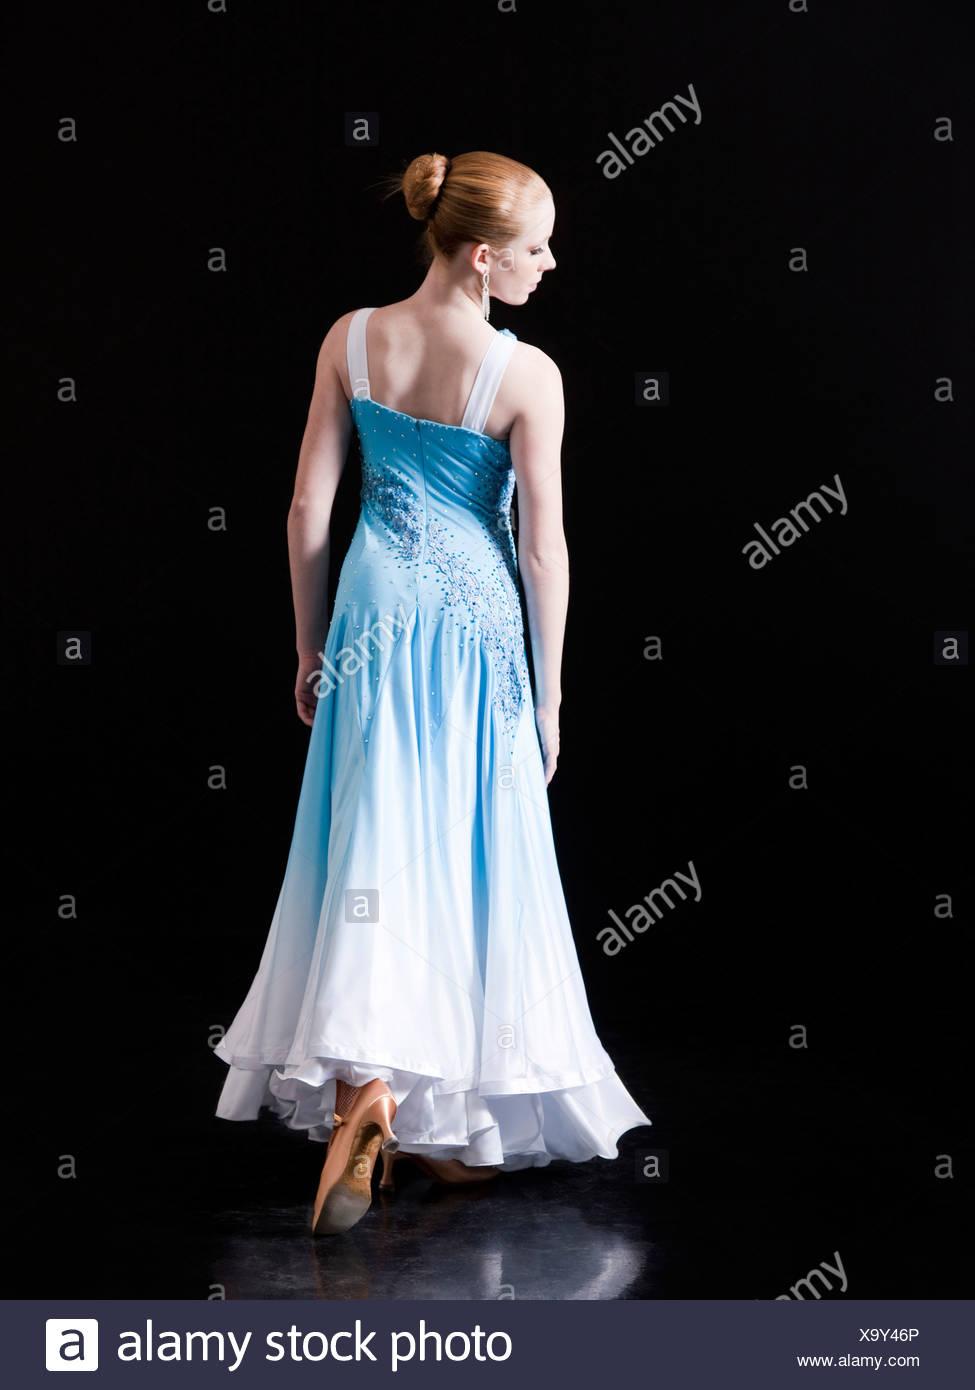 Young woman posing as professional dancer, studio shot - Stock Image